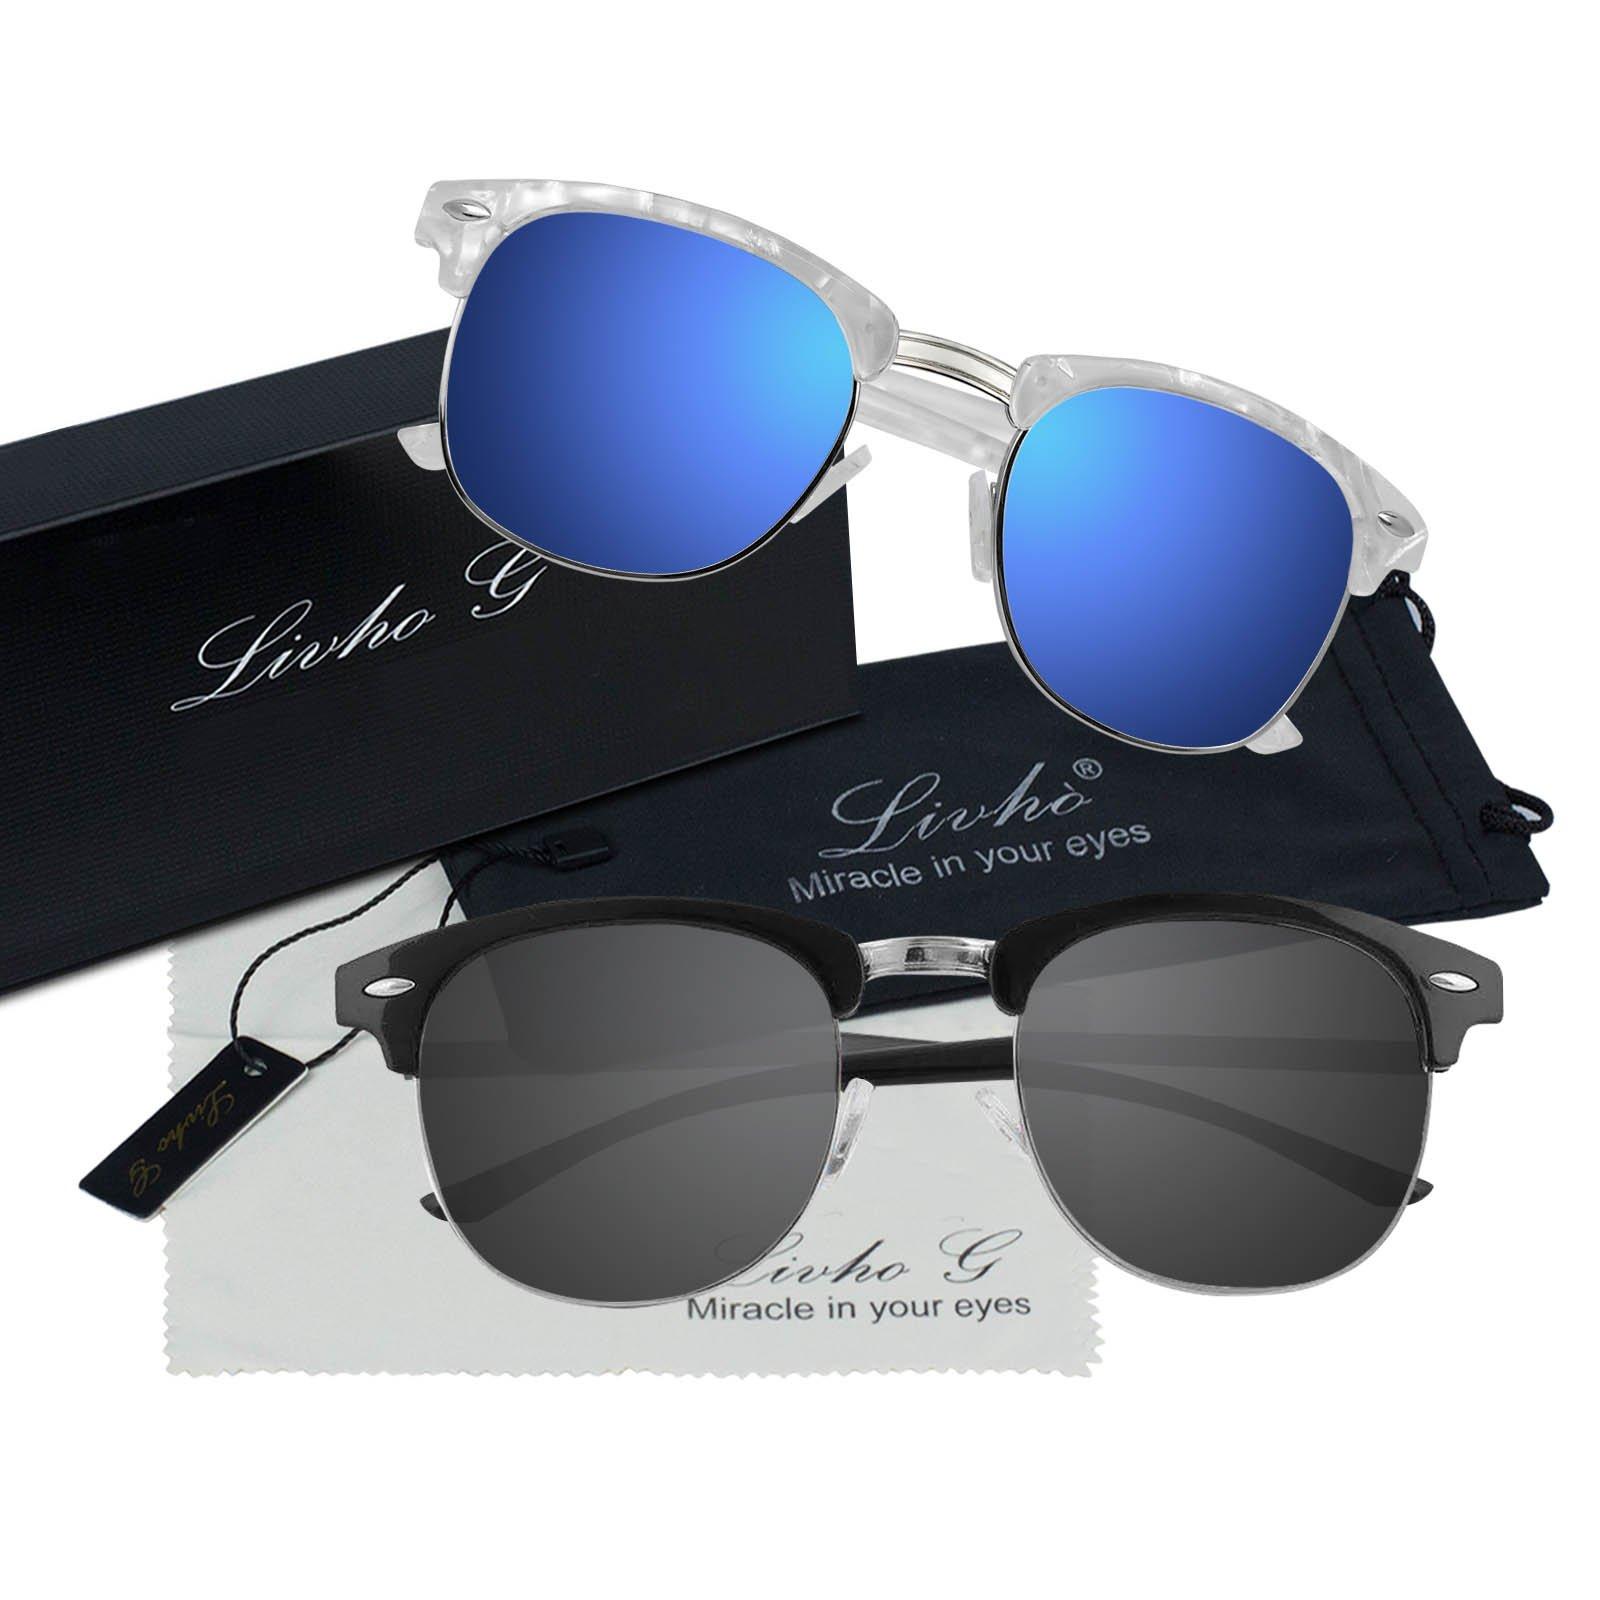 Livhò Polarized Sunglasses Women Men Semi Rimless Frame Retro Sunglasses (White Blue + Black Grey)